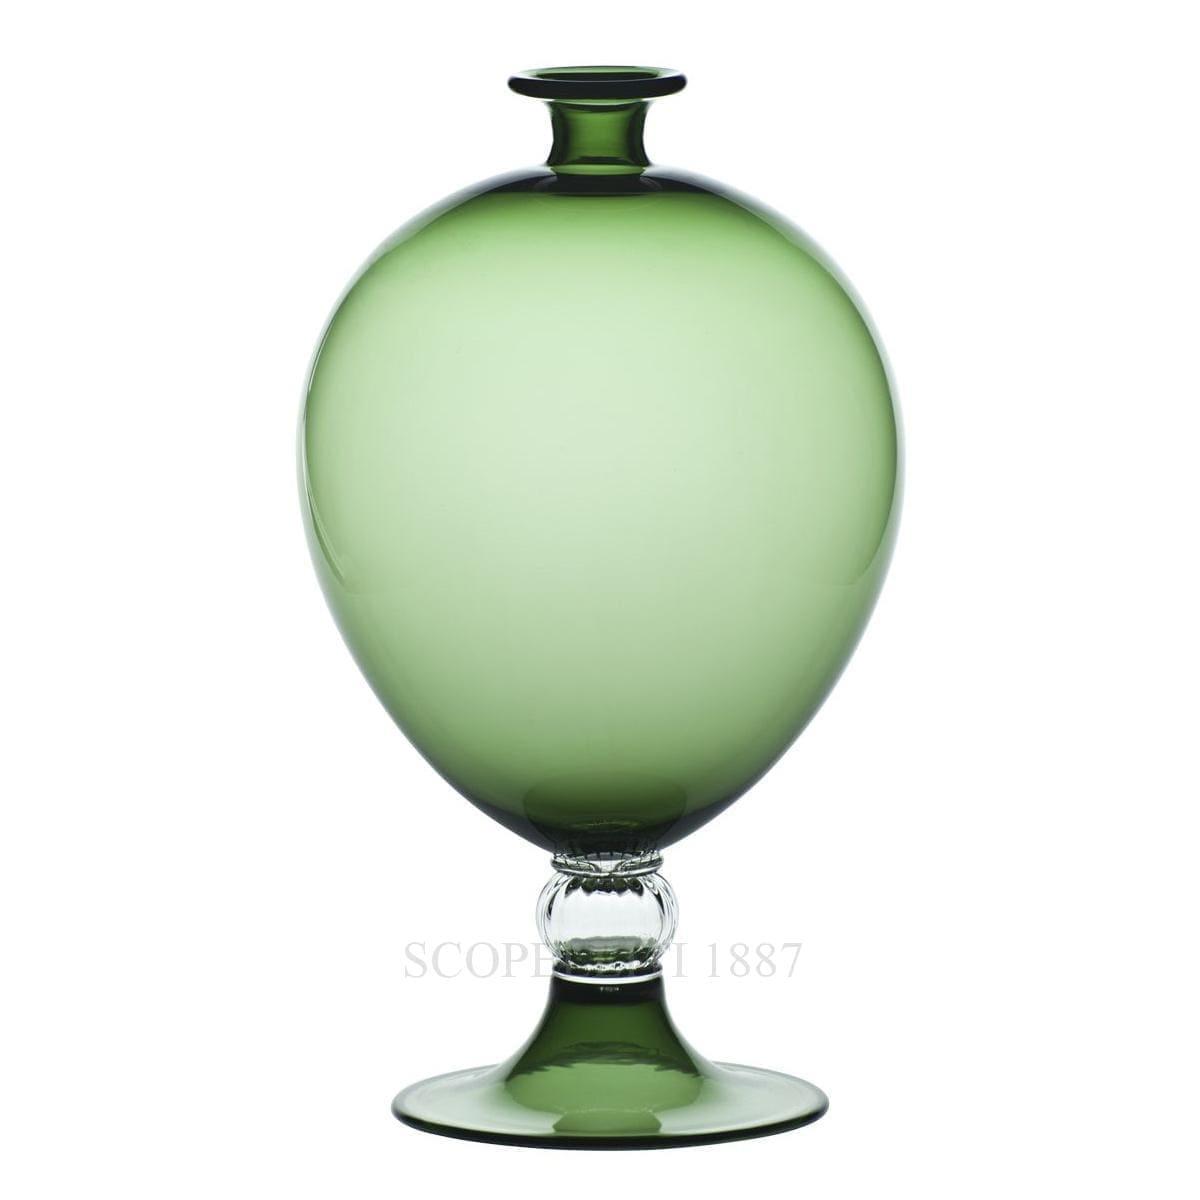 venini italian designer veronese apple green vase murano glass